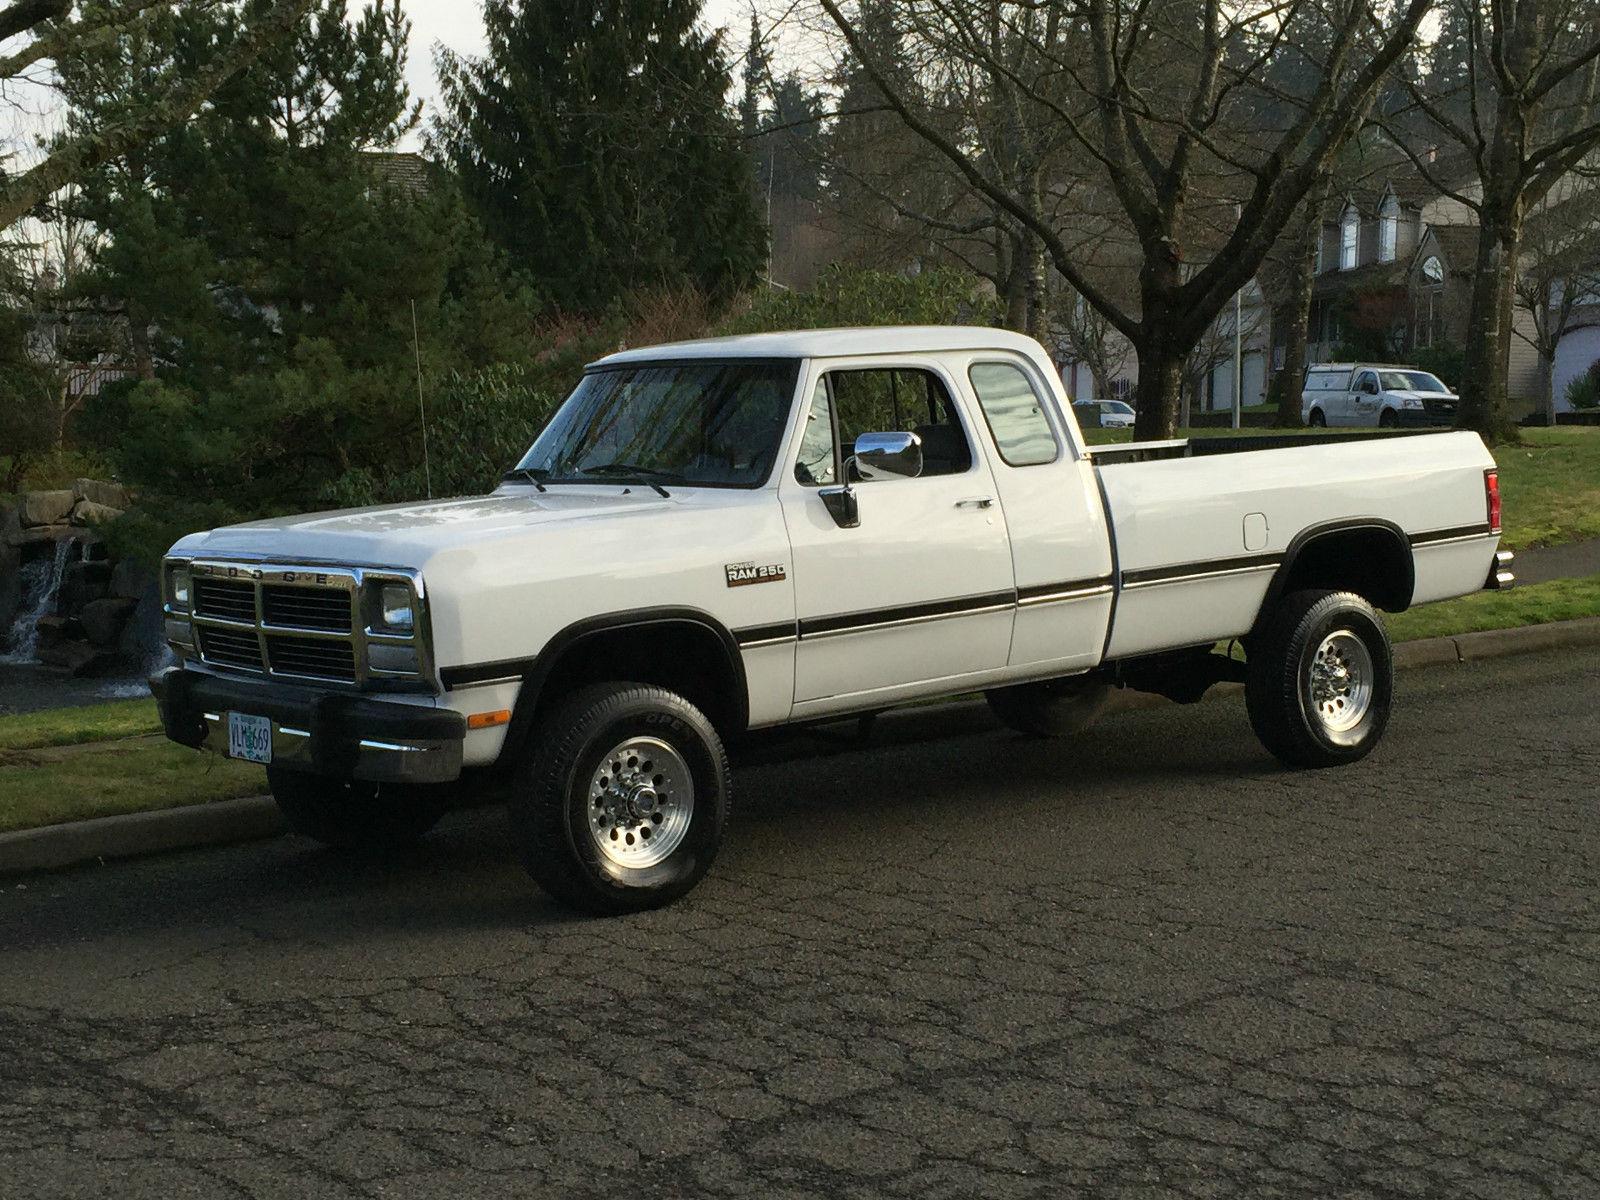 1993 dodge ram 2500 4x4 extra cab cummins diesel first gen 116k miles like new for sale in. Black Bedroom Furniture Sets. Home Design Ideas